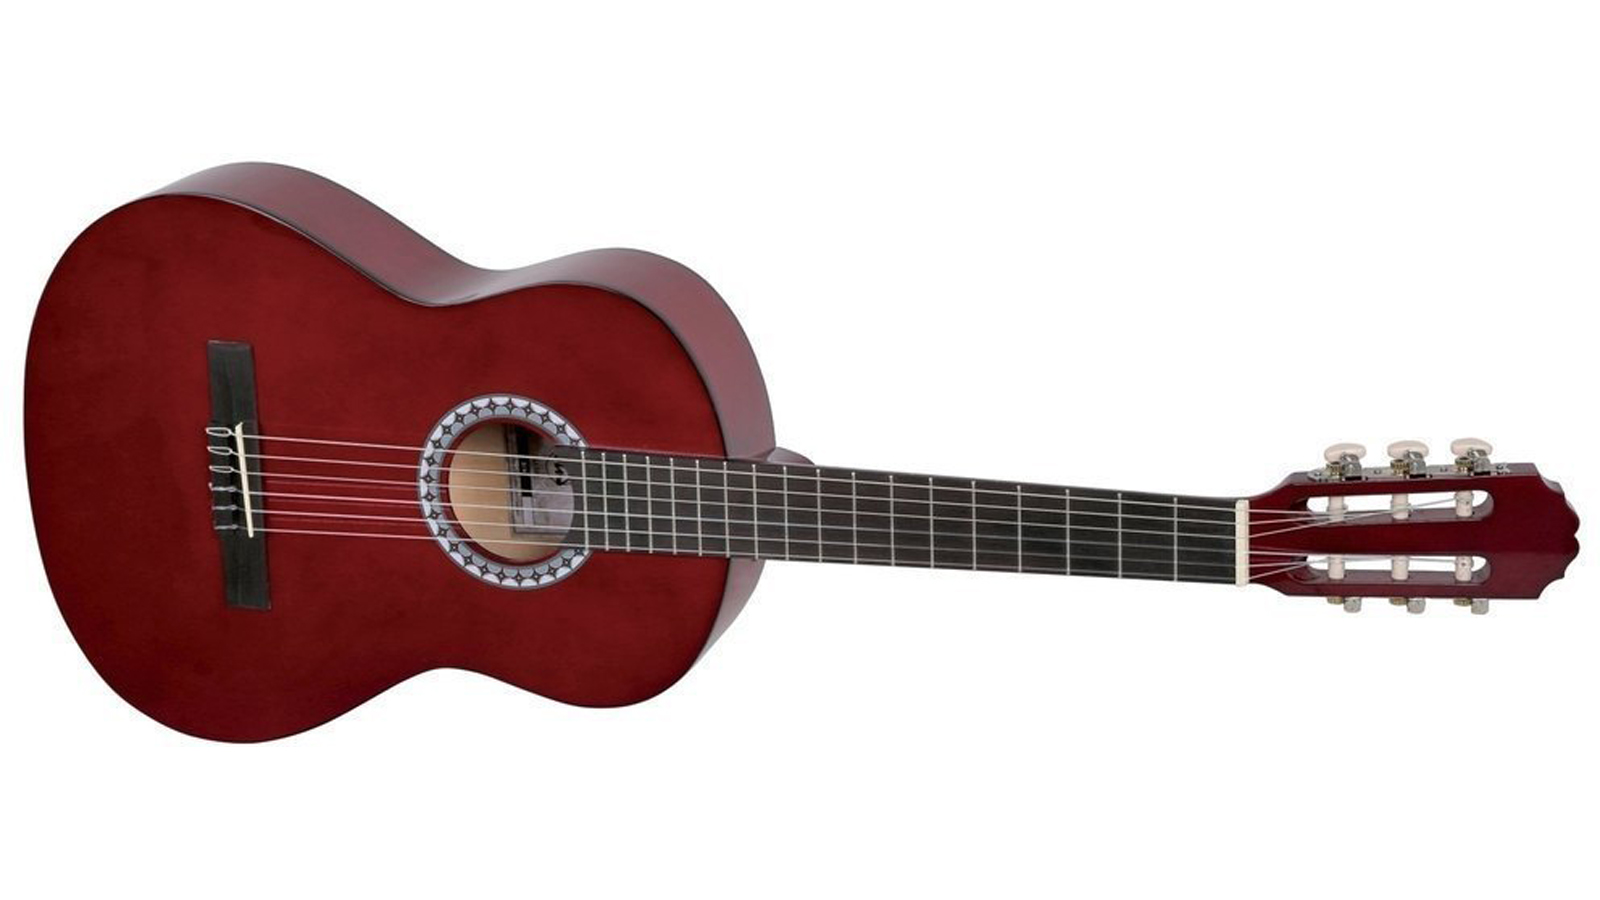 VGS Konzertgitarre 3/4 Rot Basic